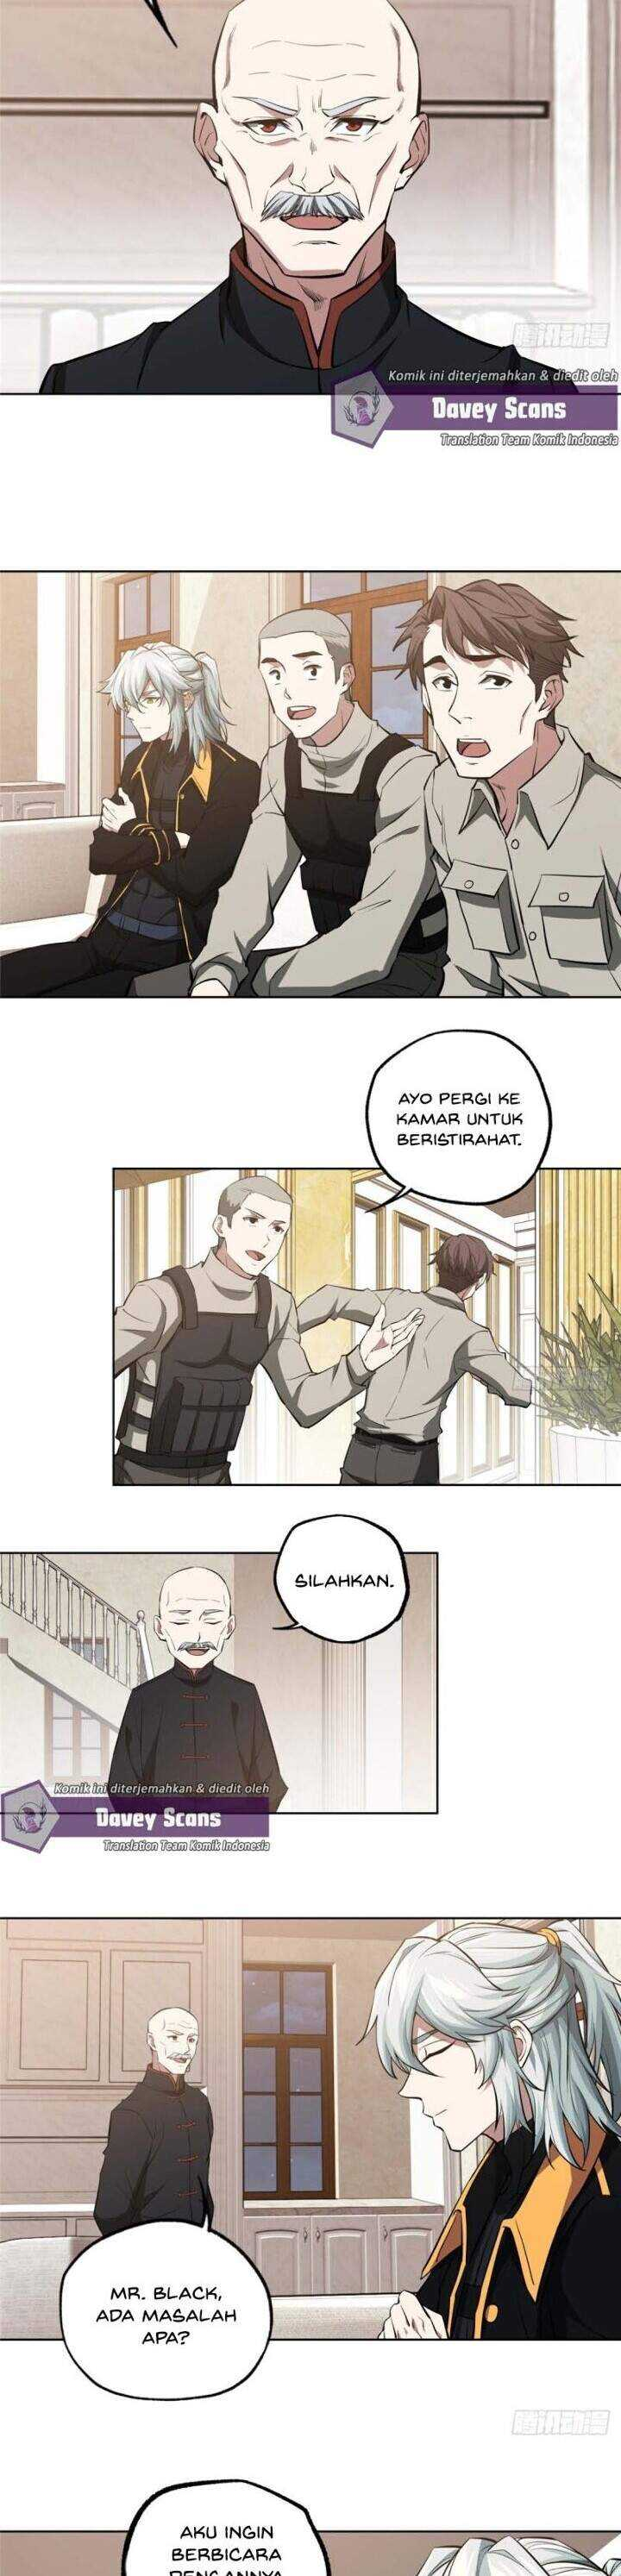 Super Mechanic Chapter 73